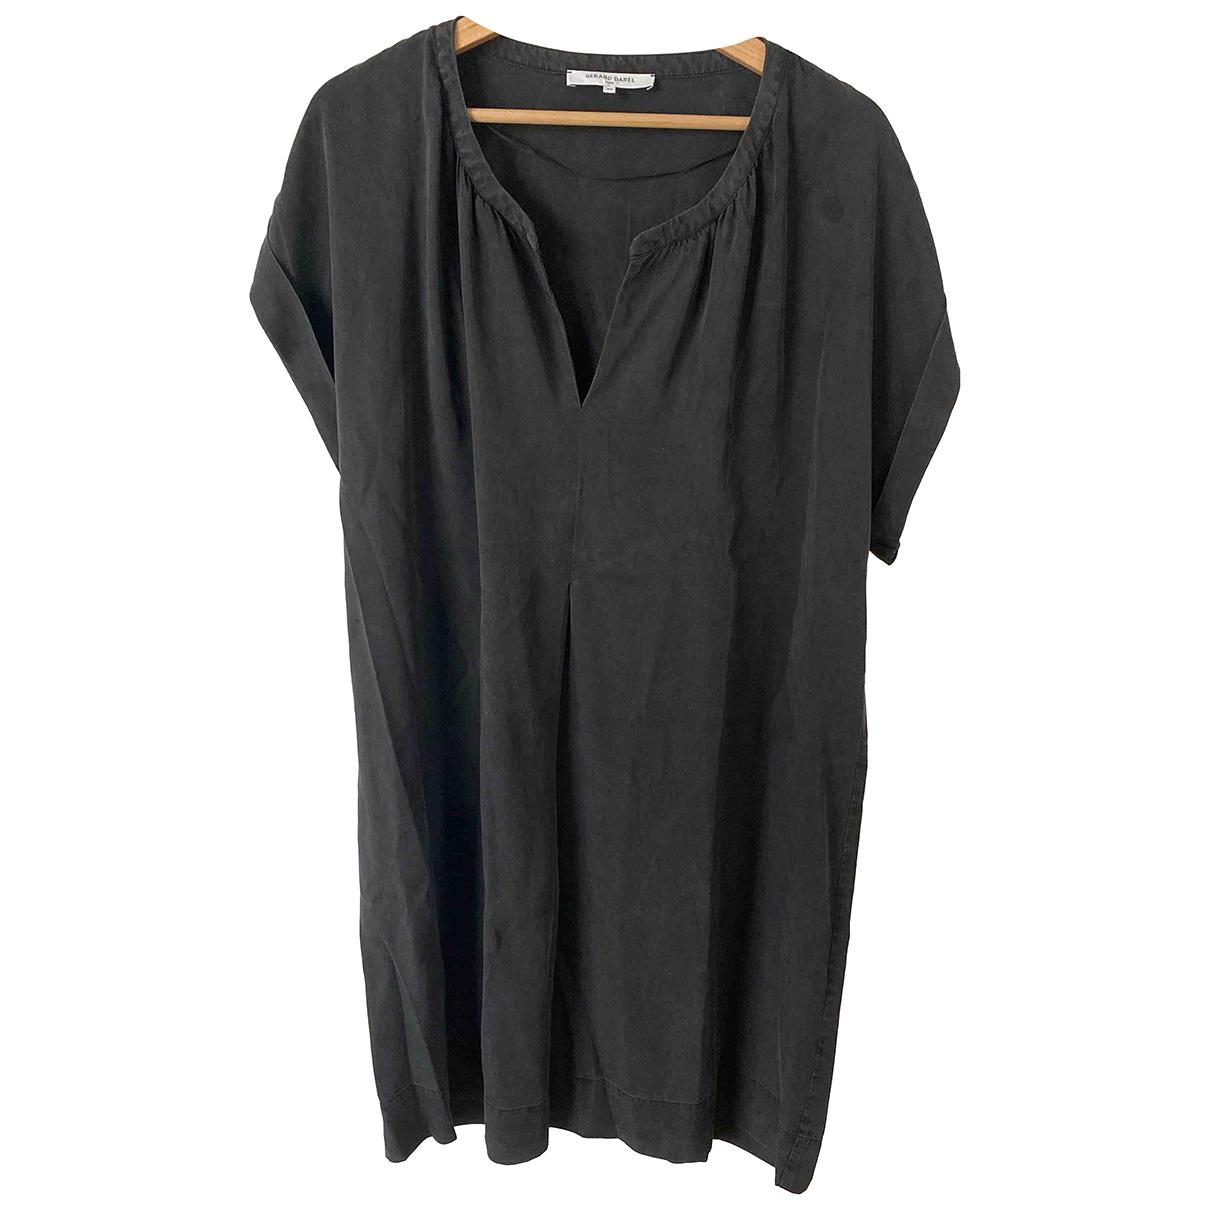 Gerard Darel N Anthracite Cotton dress for Women 46 FR